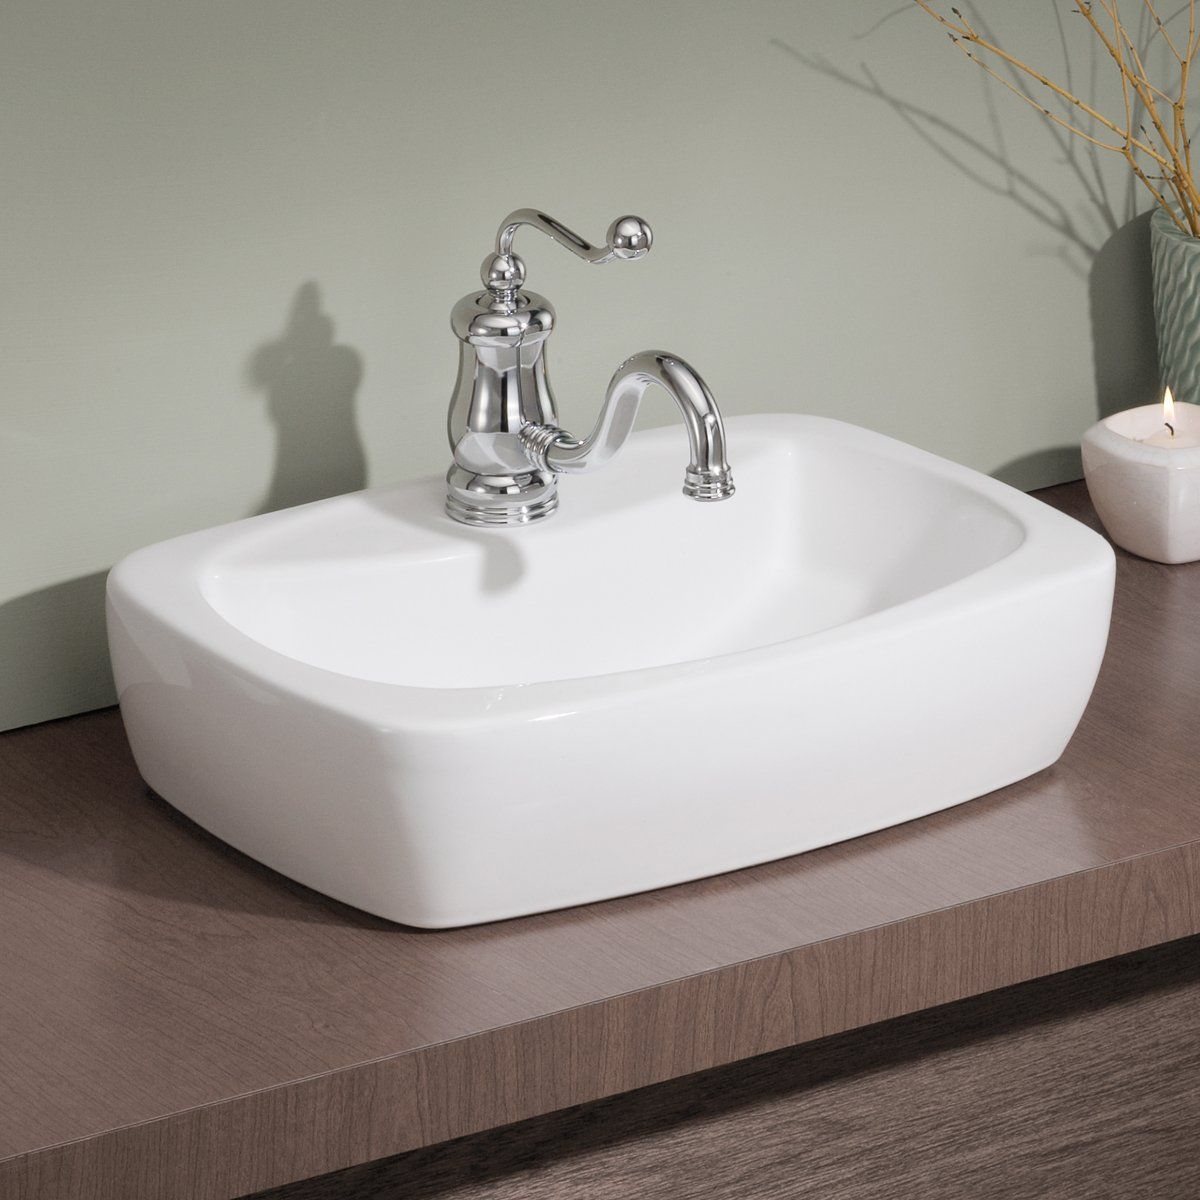 Cheviot 1270w Thema Overcounter Self Bathroom Sink White Lowe S Canada